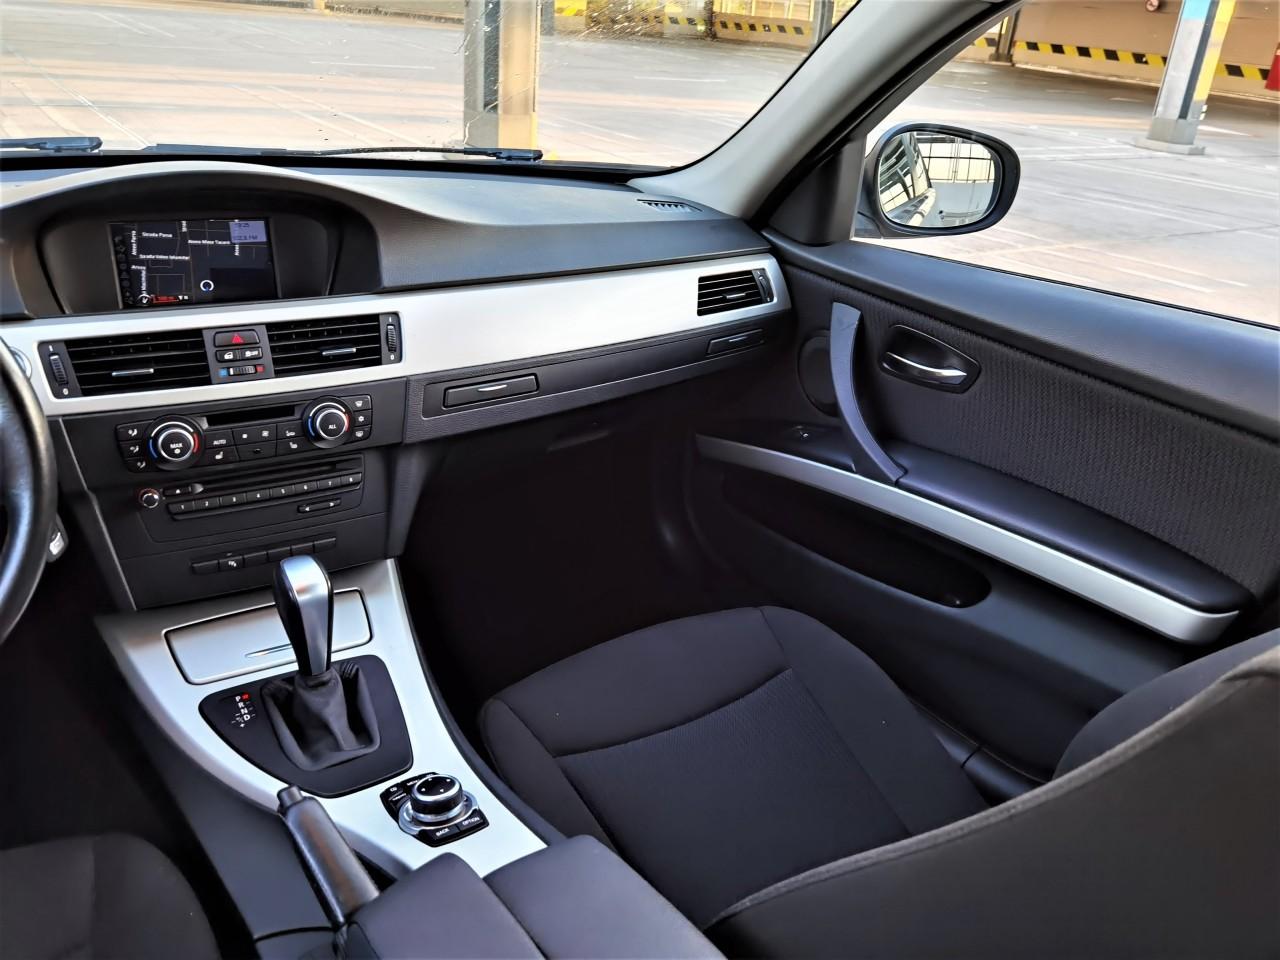 BMW 318 2.0 2011